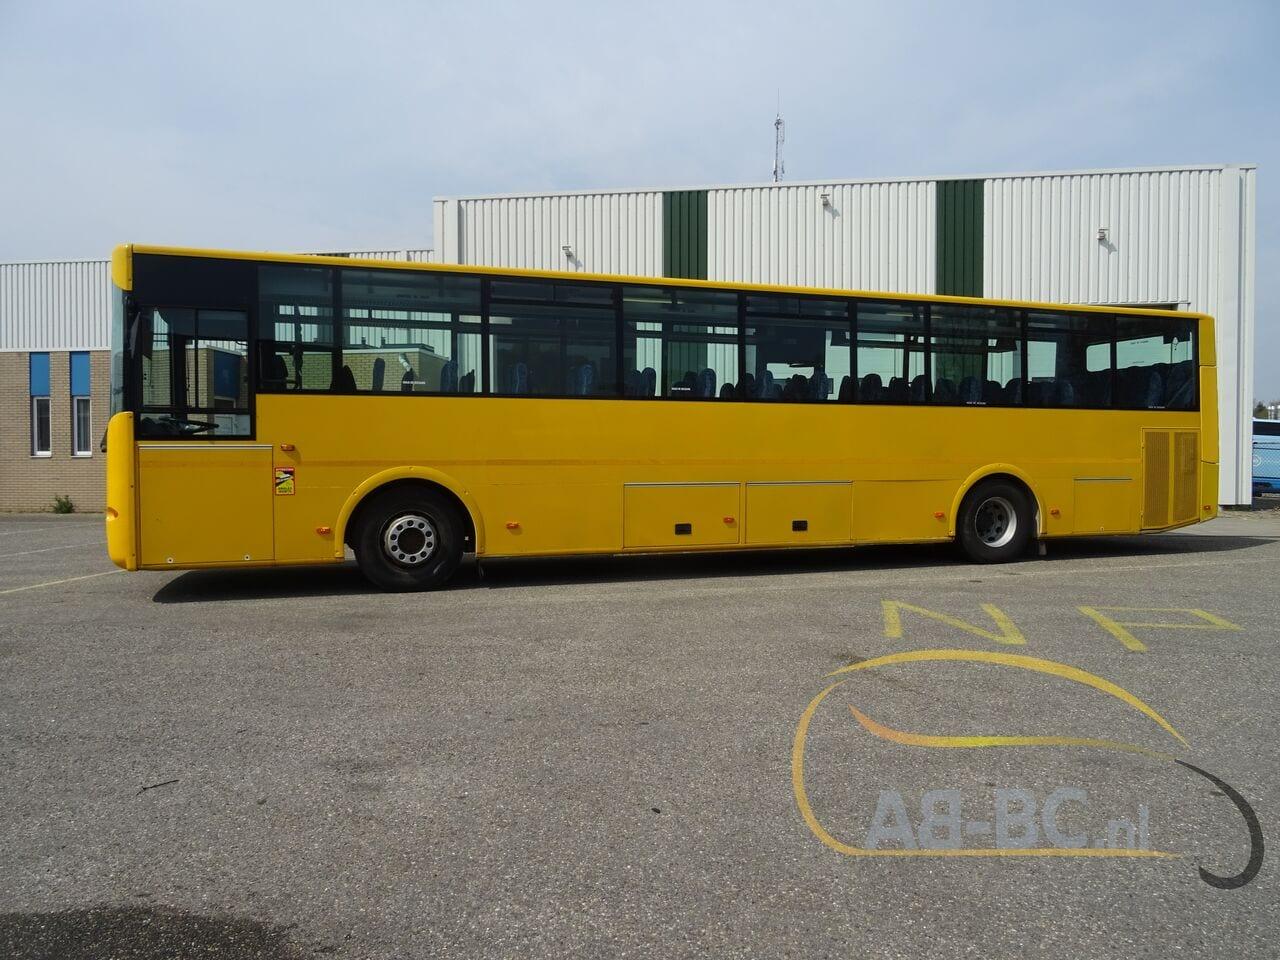 interurban-busMAN-Fast-64-seats---1619619695431047873_big_f707a308f790c4c670ed9295be10a26e--21042817163019598600